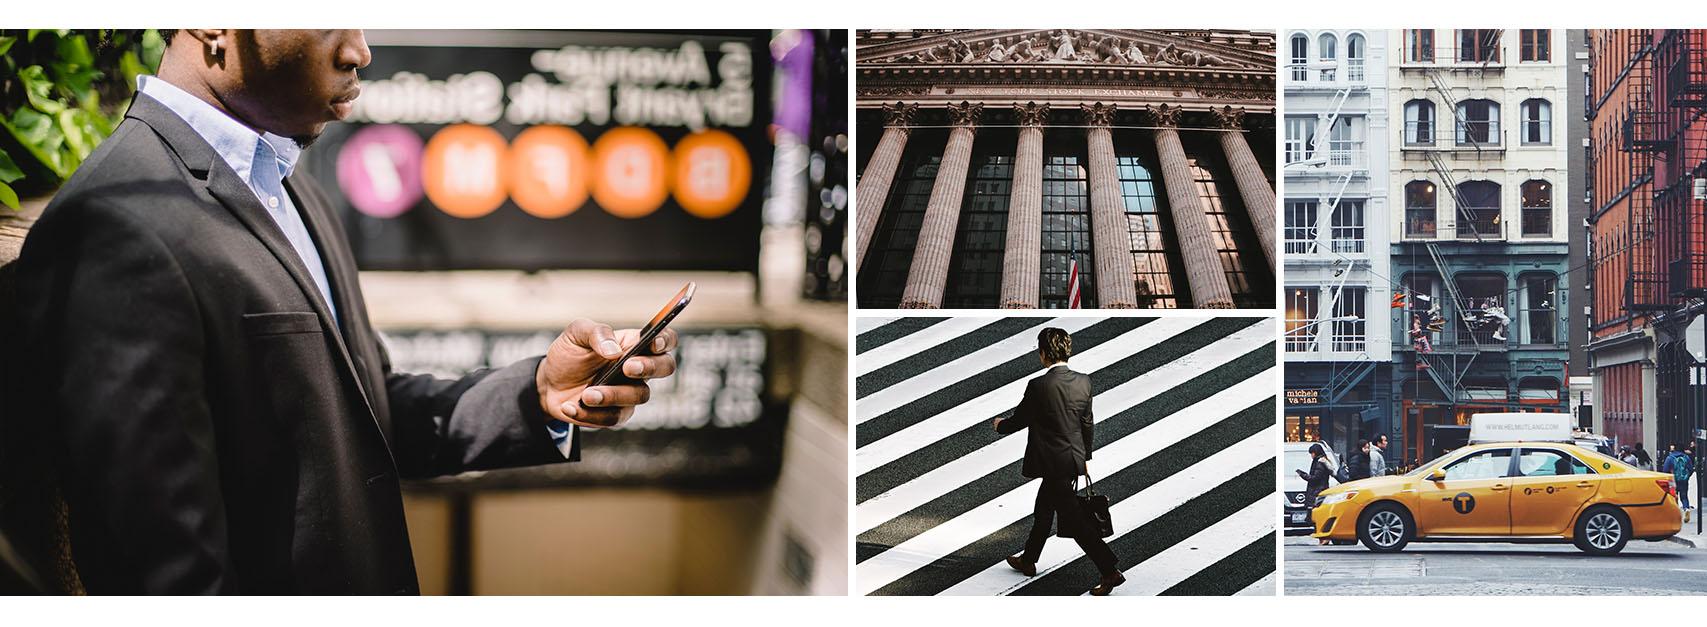 New York City Careers